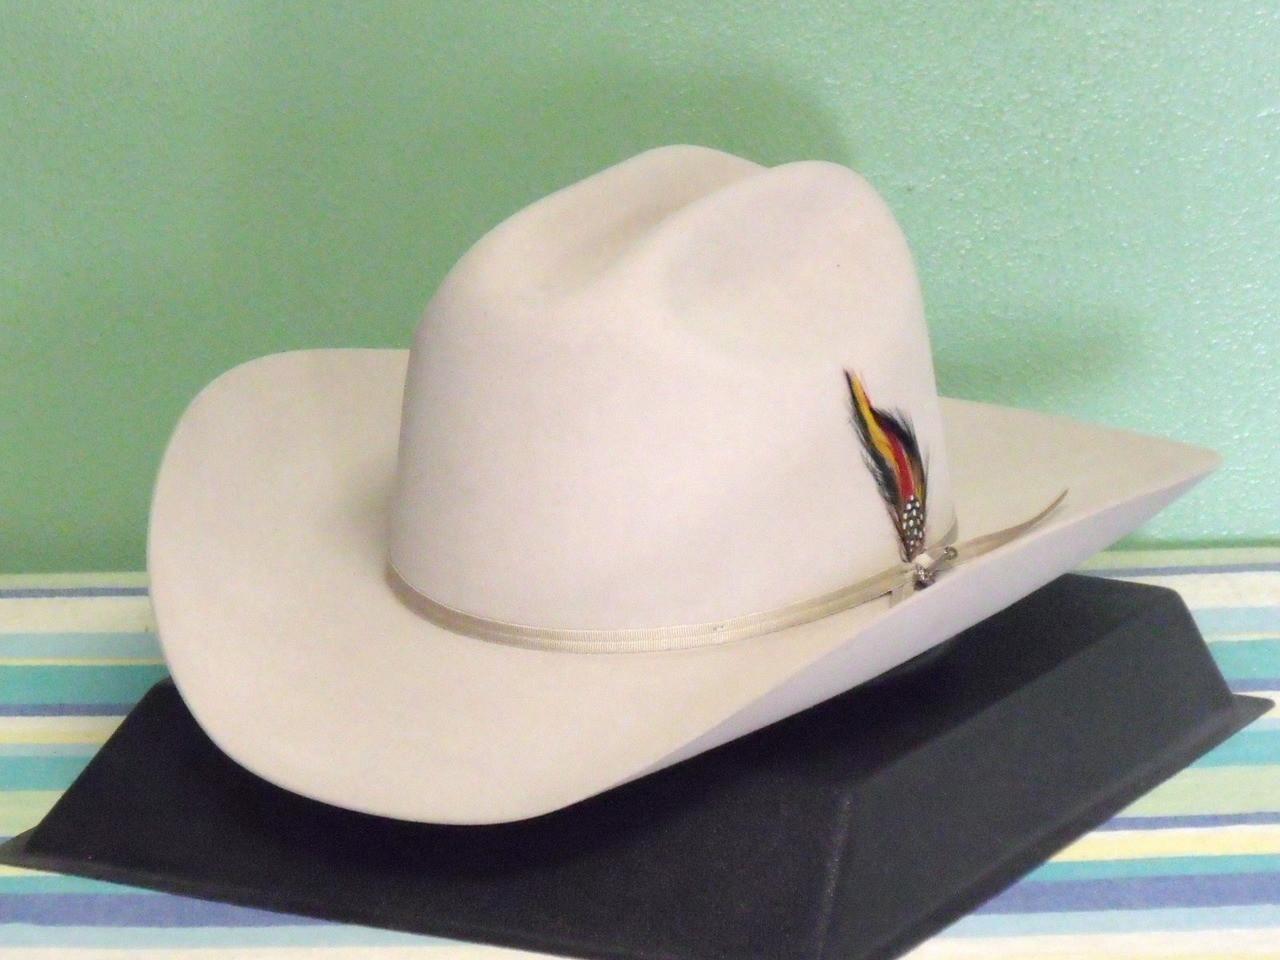 Stetson Roper 6X Fur Felt Cowboy Hat - One 2 mini Ranch 0e136653c54